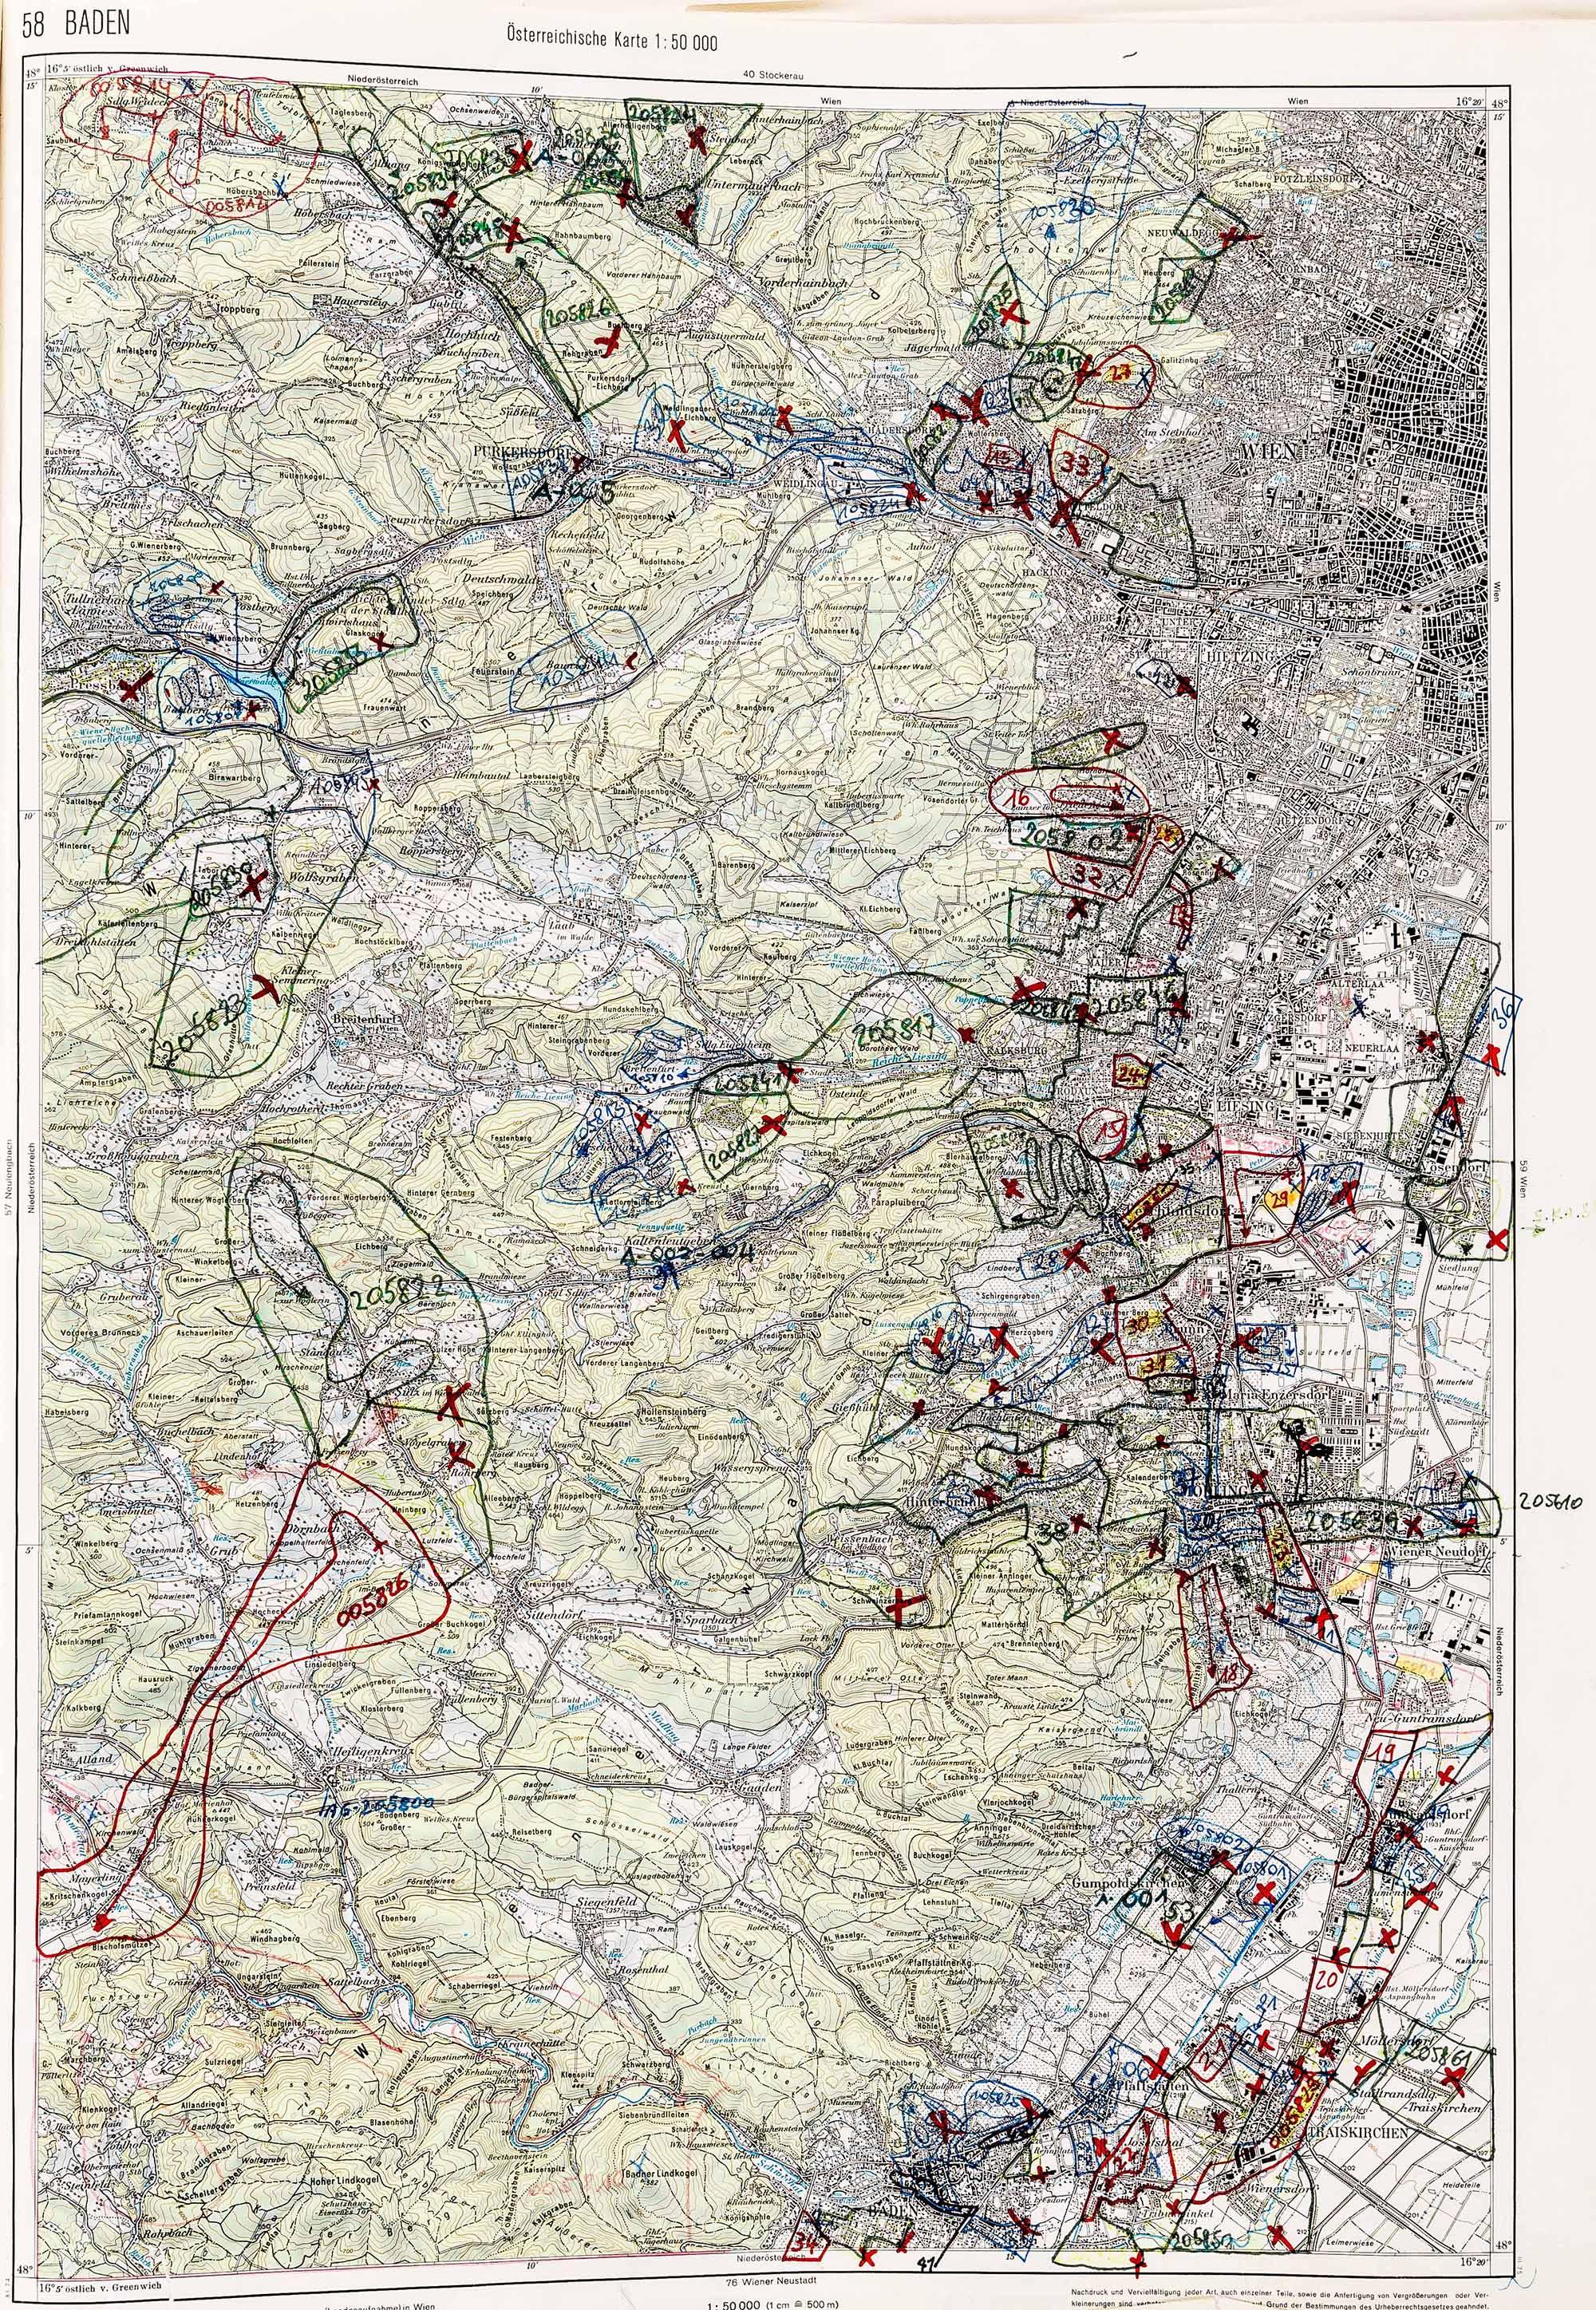 1979-1982 Karte 058